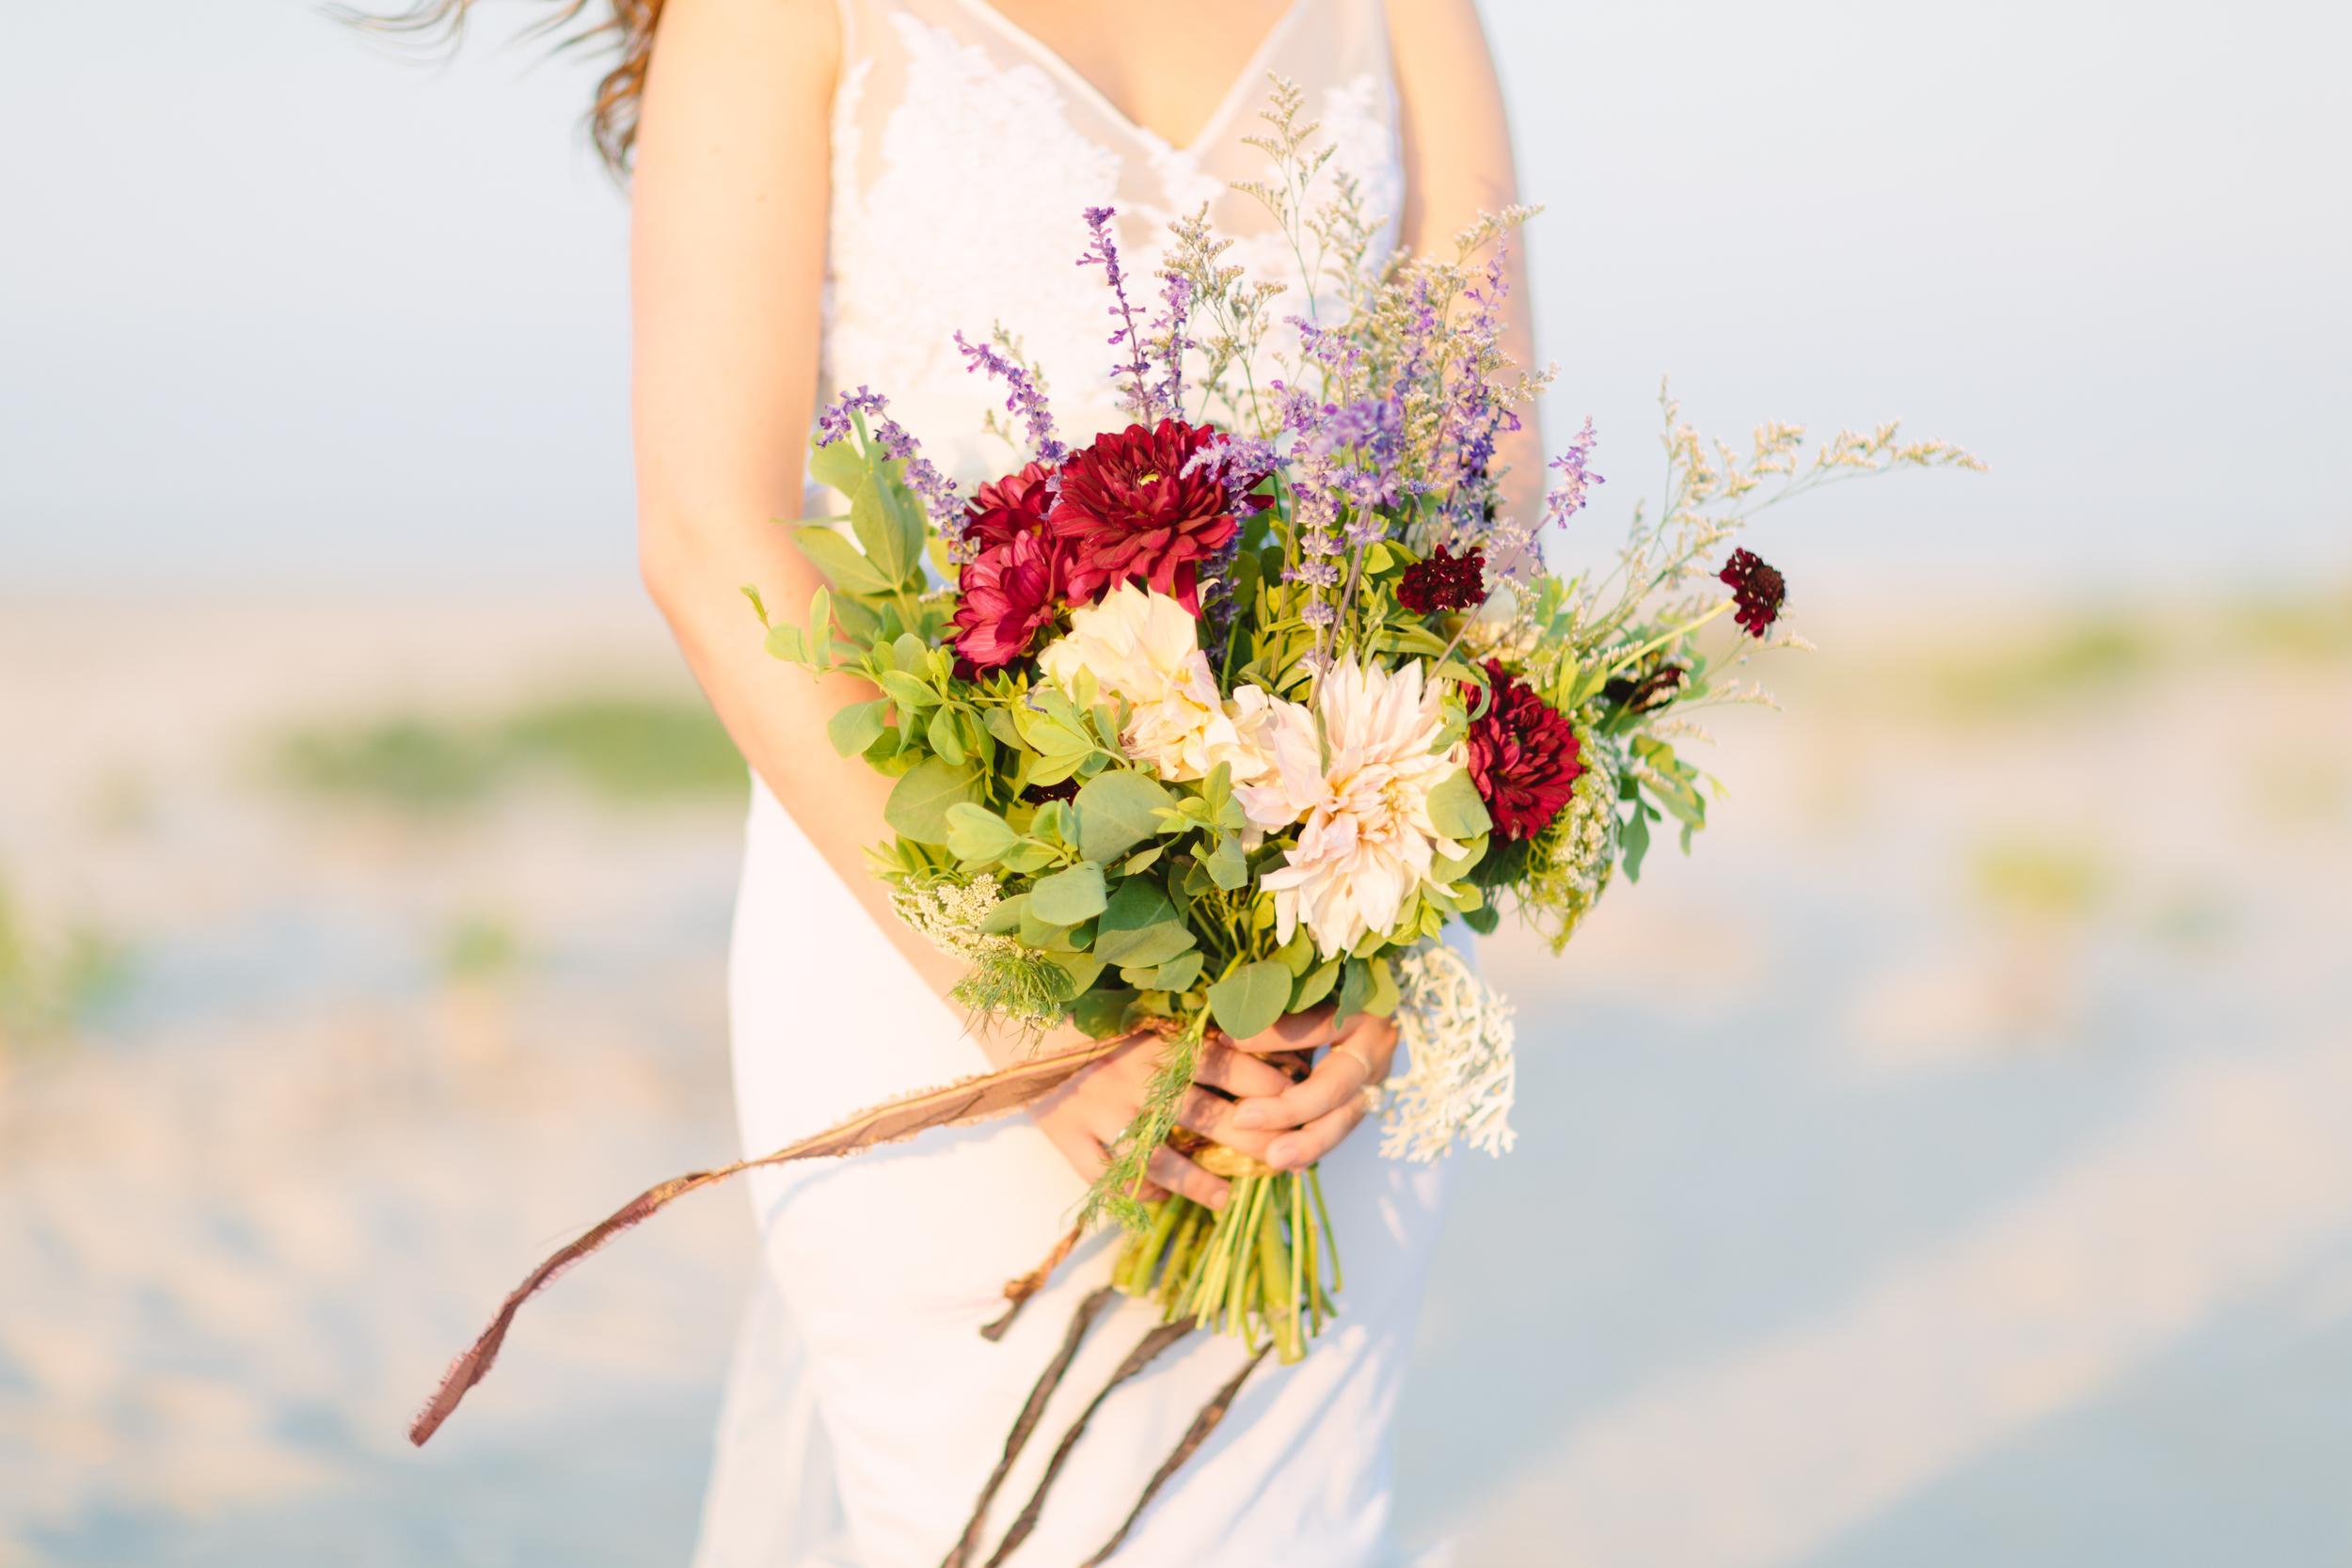 New-Jersey-Wedding-Photographer_Jessica-Cooper-Photography-33.jpg